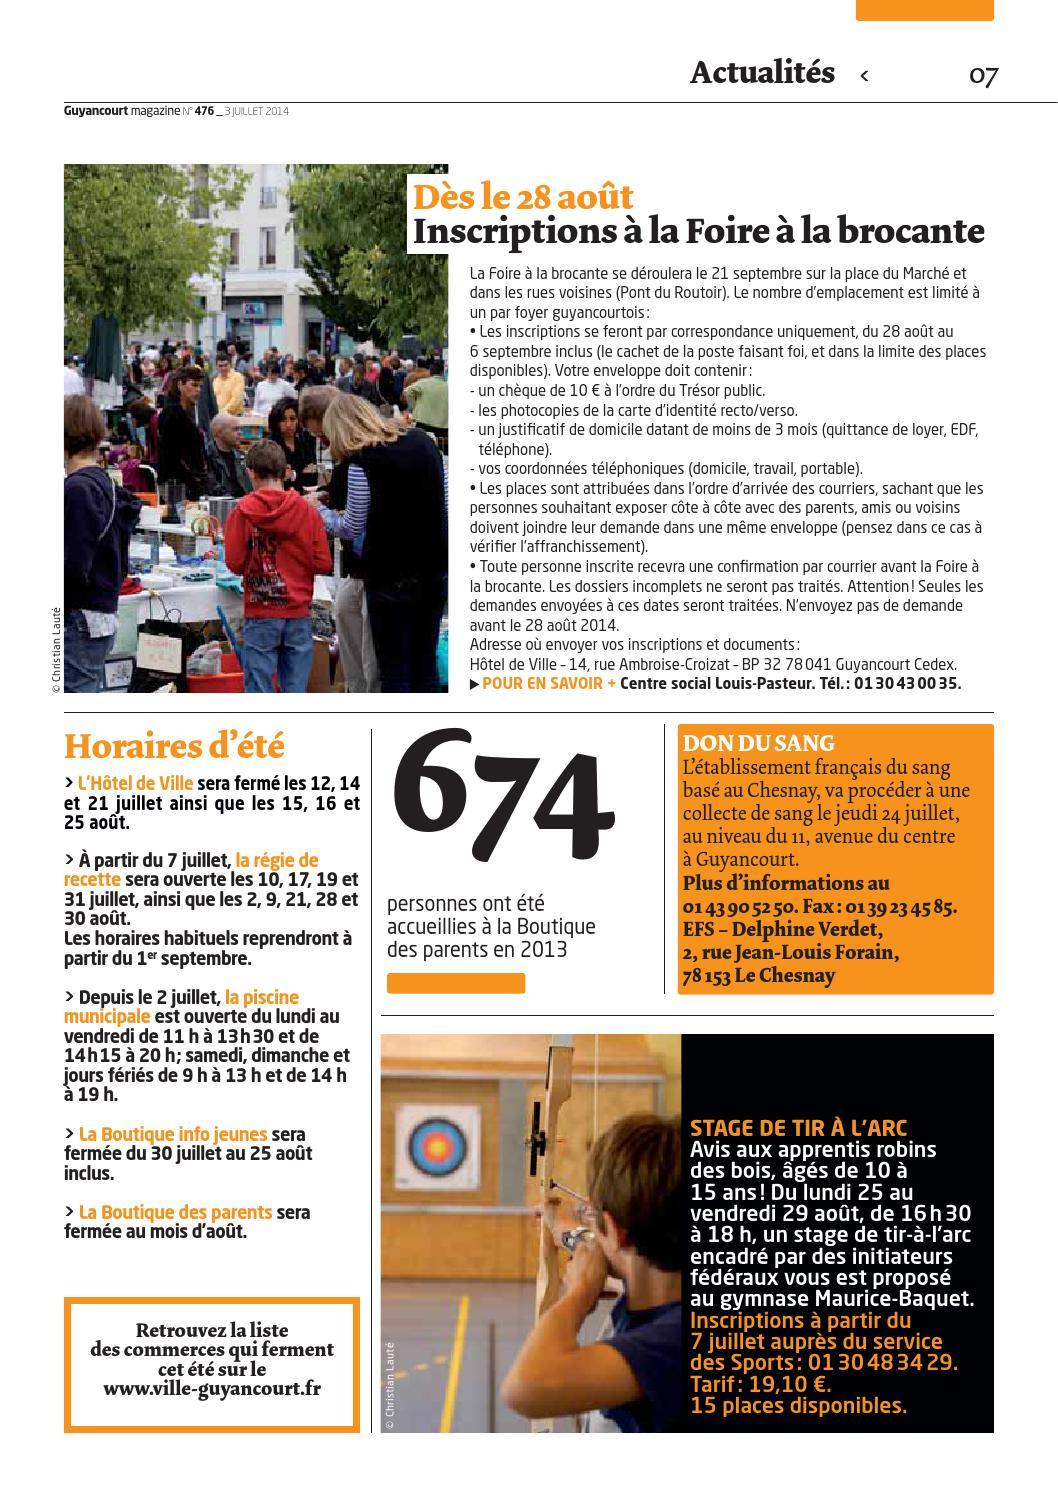 Guyancourt magazine 476 by Ville de Guyancourt - issuu 8997f713e70